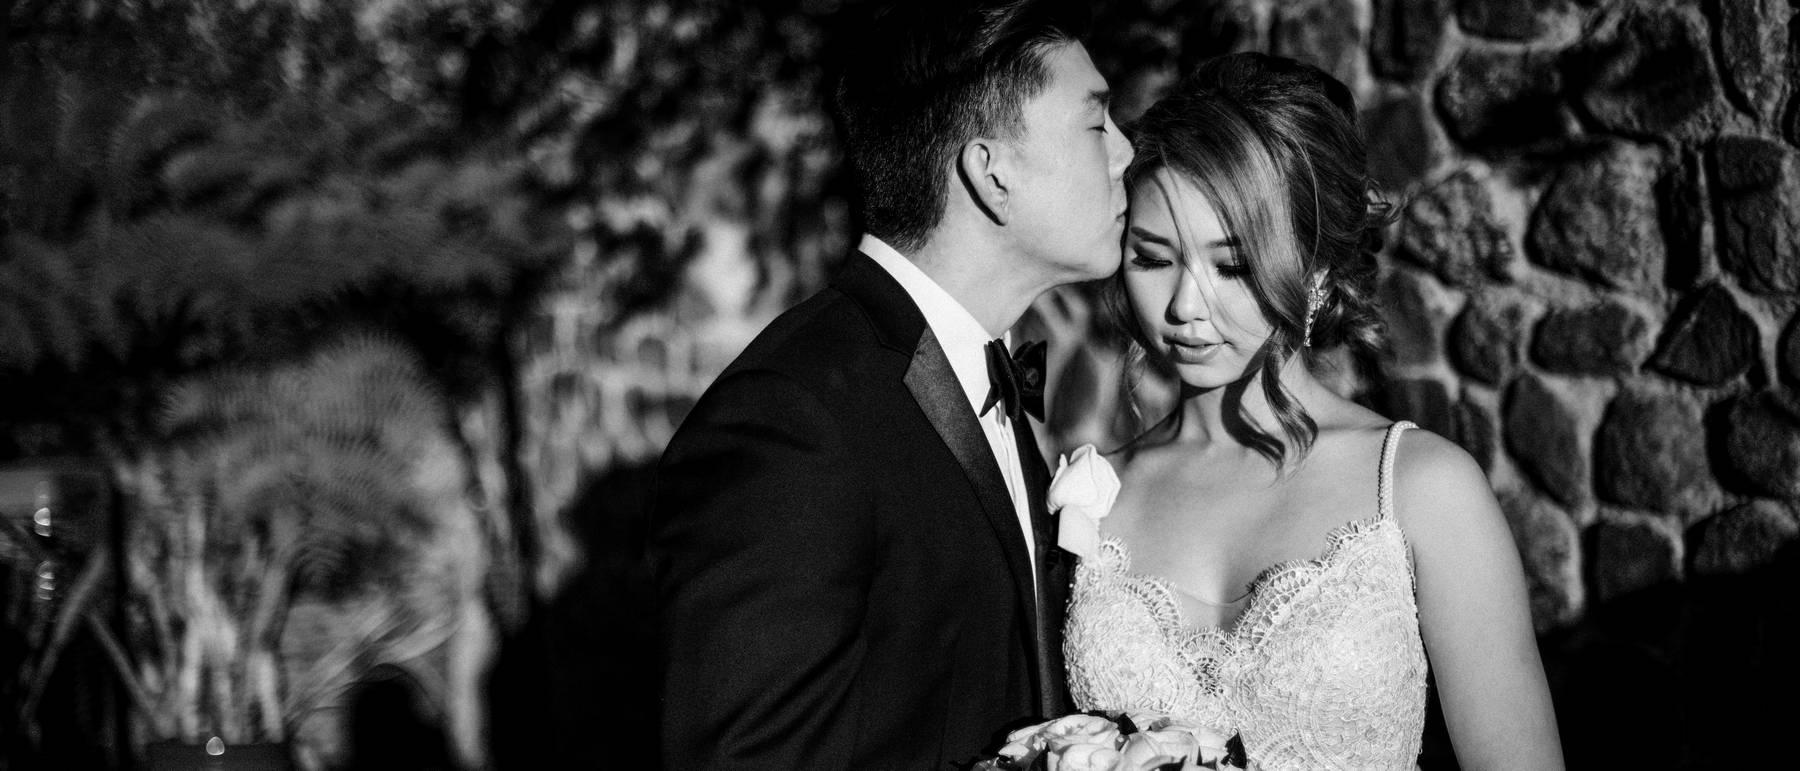 johnandjoseph-wedding-photographer-hz-slider-290